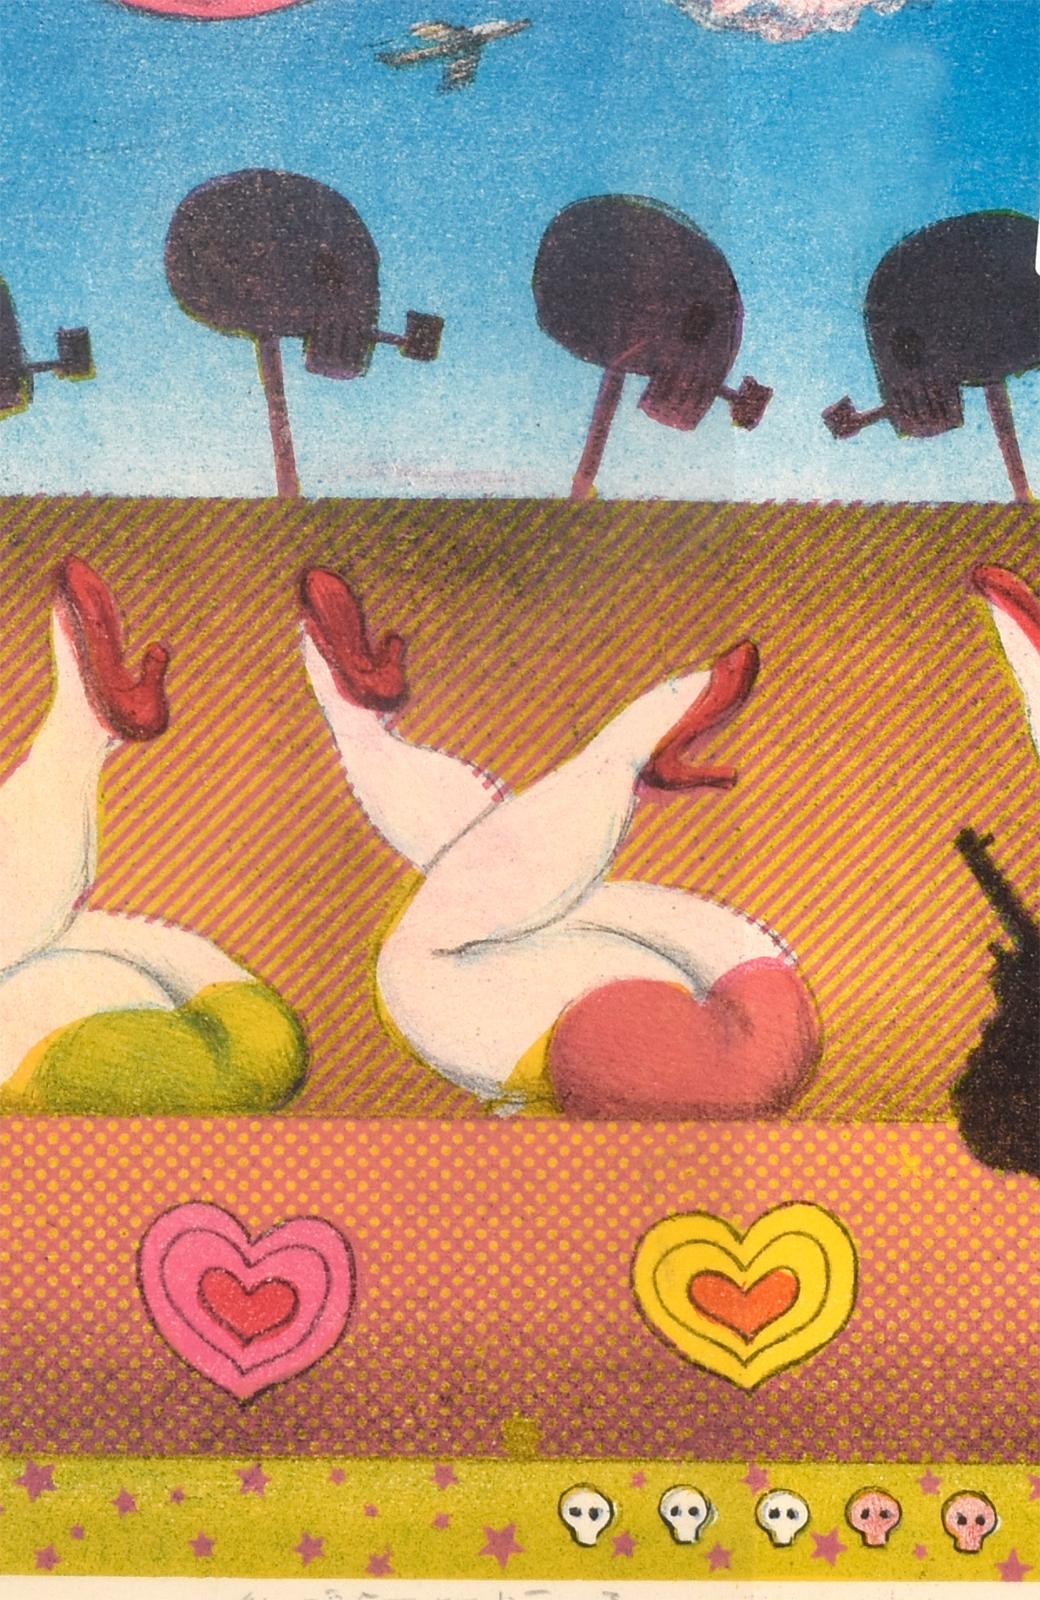 haco! 【アート】馬場檮男 「クレージーキット・3」 <その他>の商品写真6